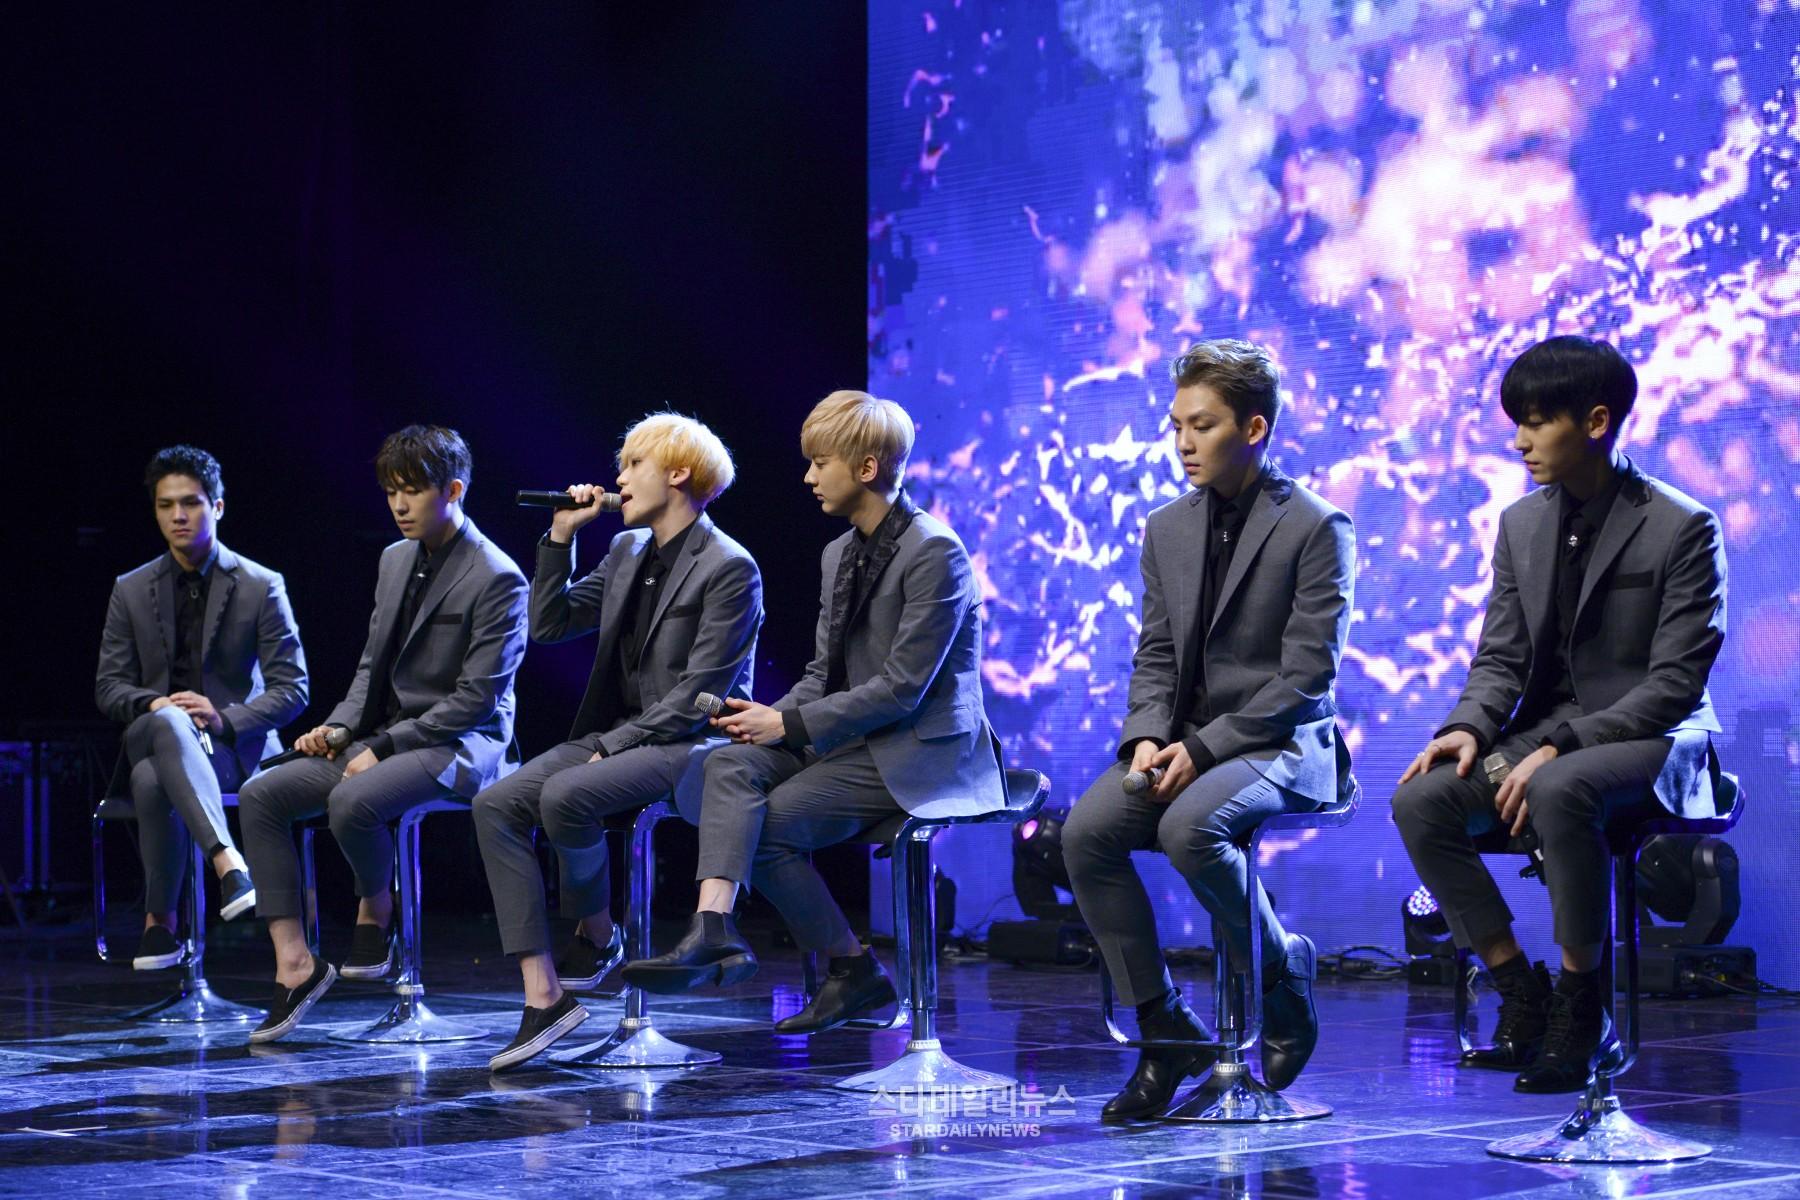 Teen Top Open Up About Hiatus Activities at Album Showcase